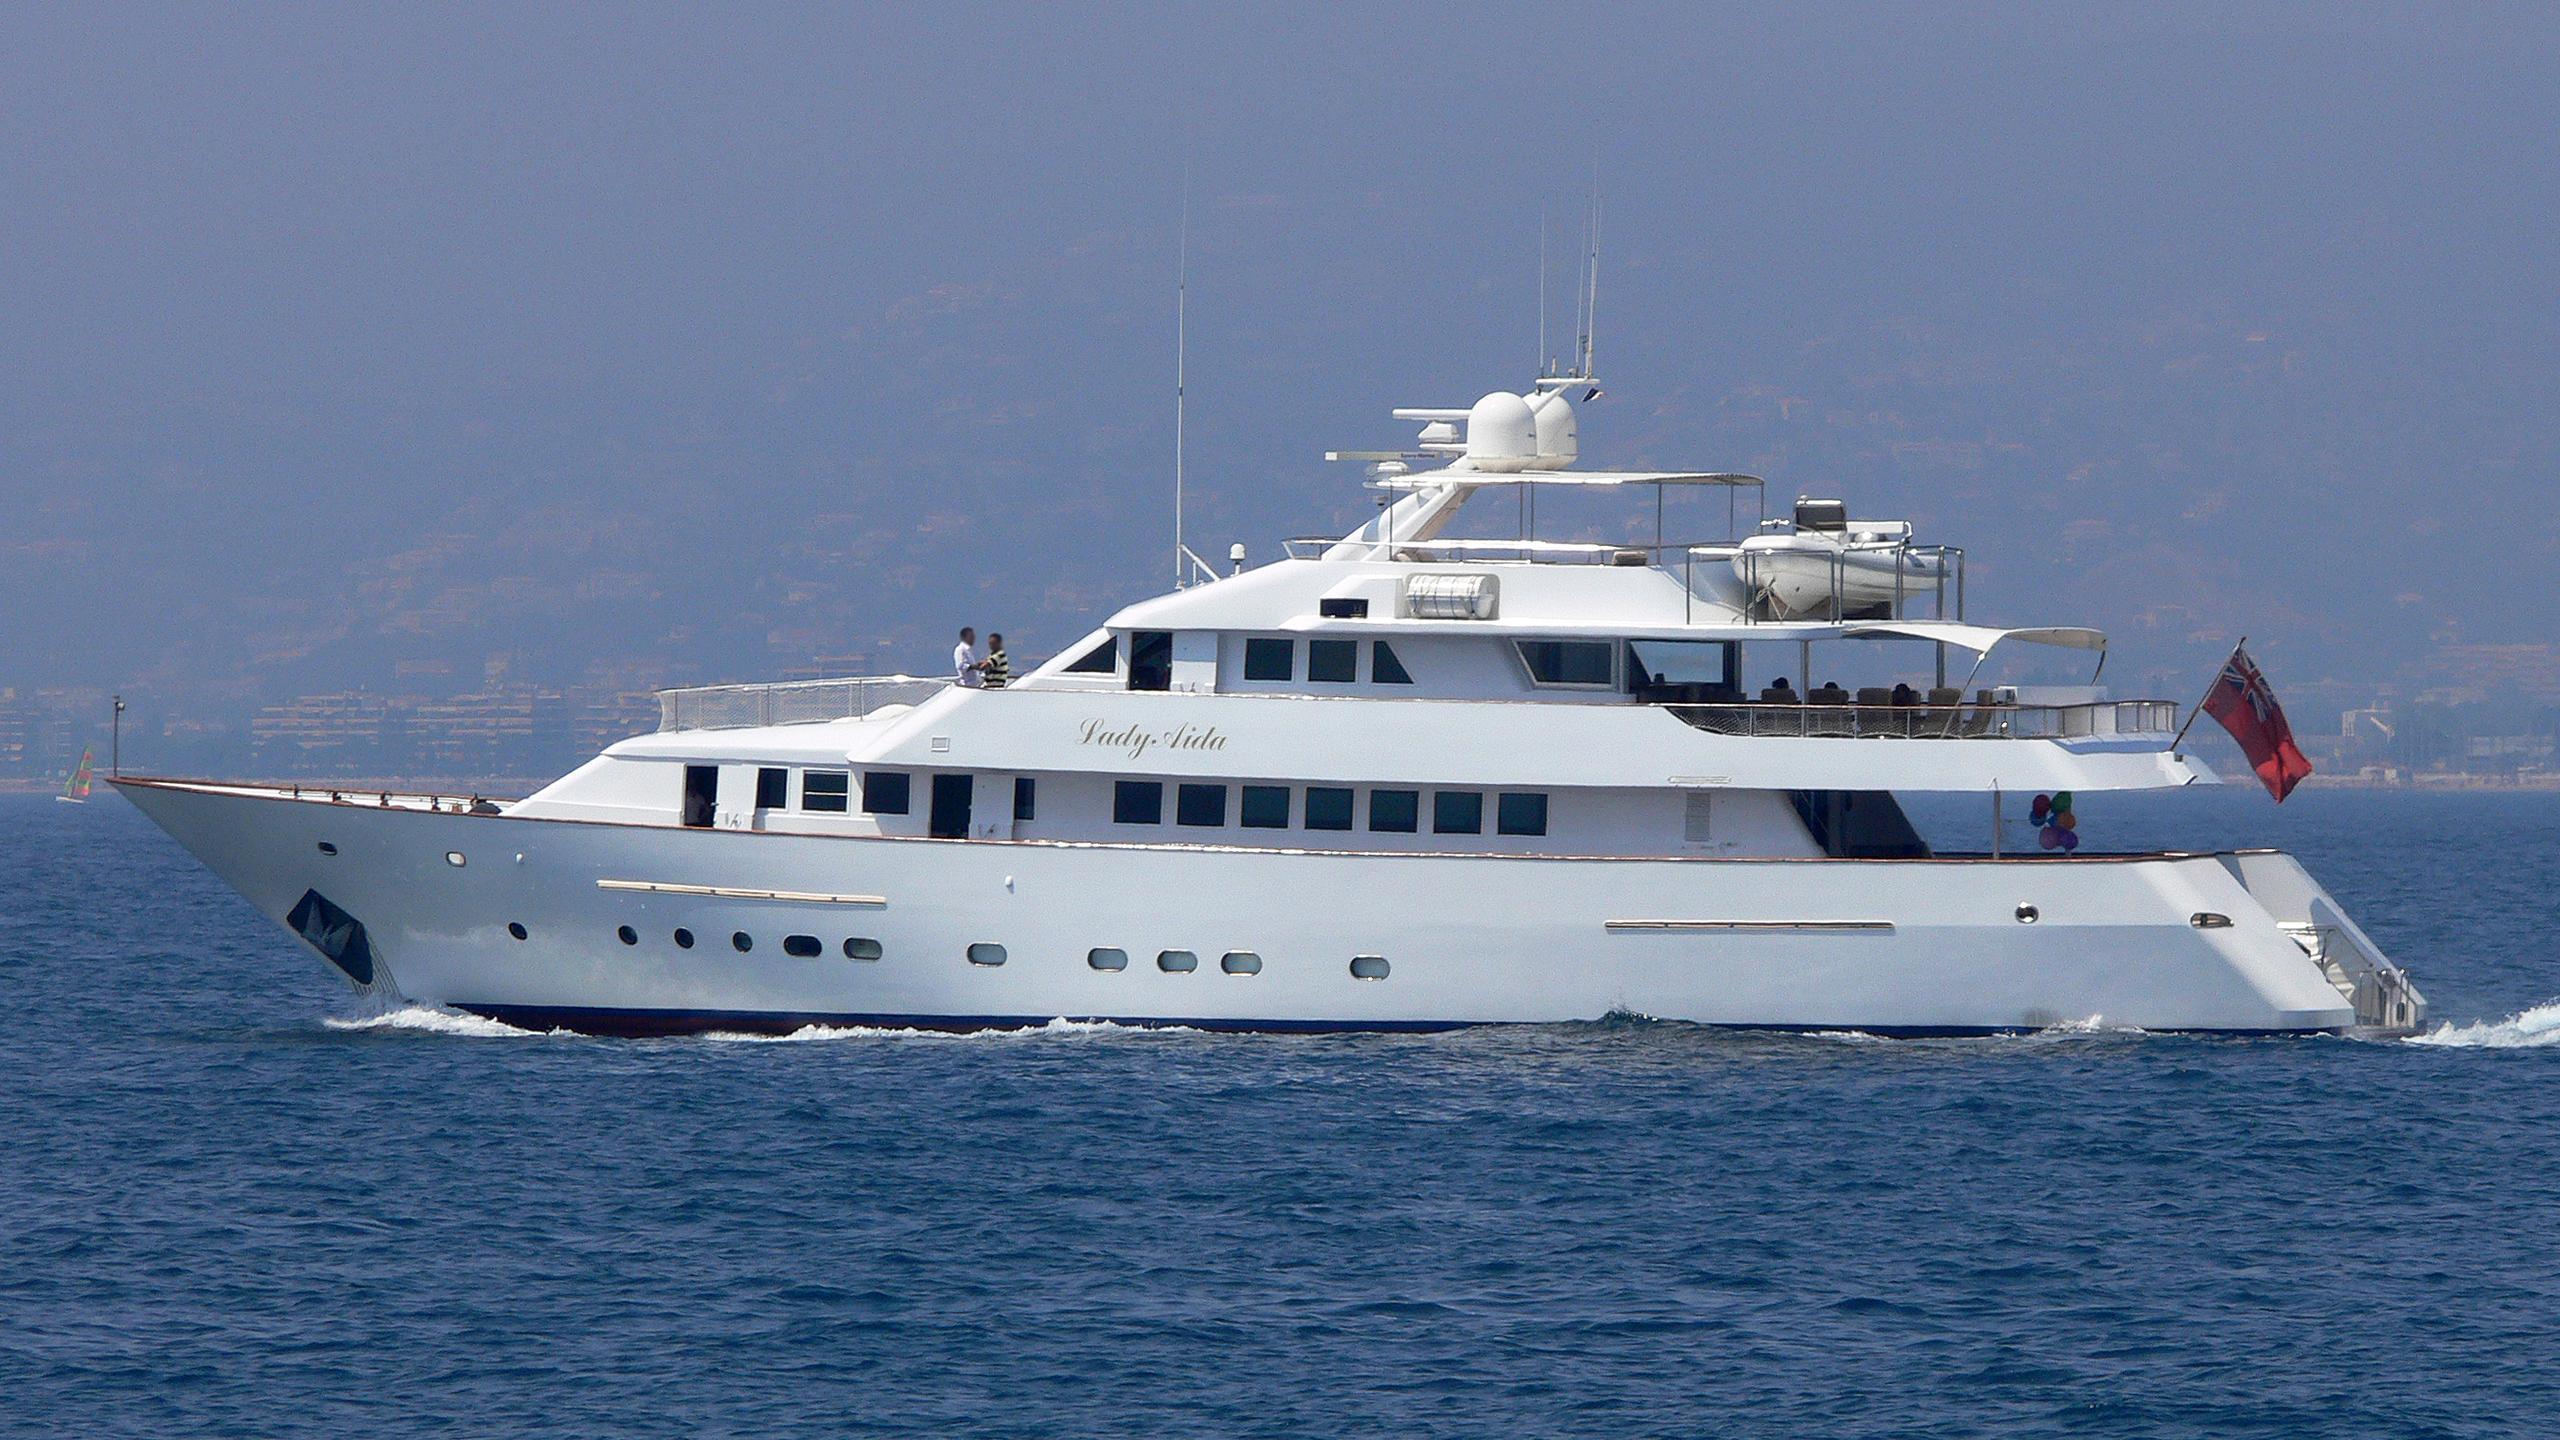 lady-aida-motor-yacht-bugari-1990-36m-profile